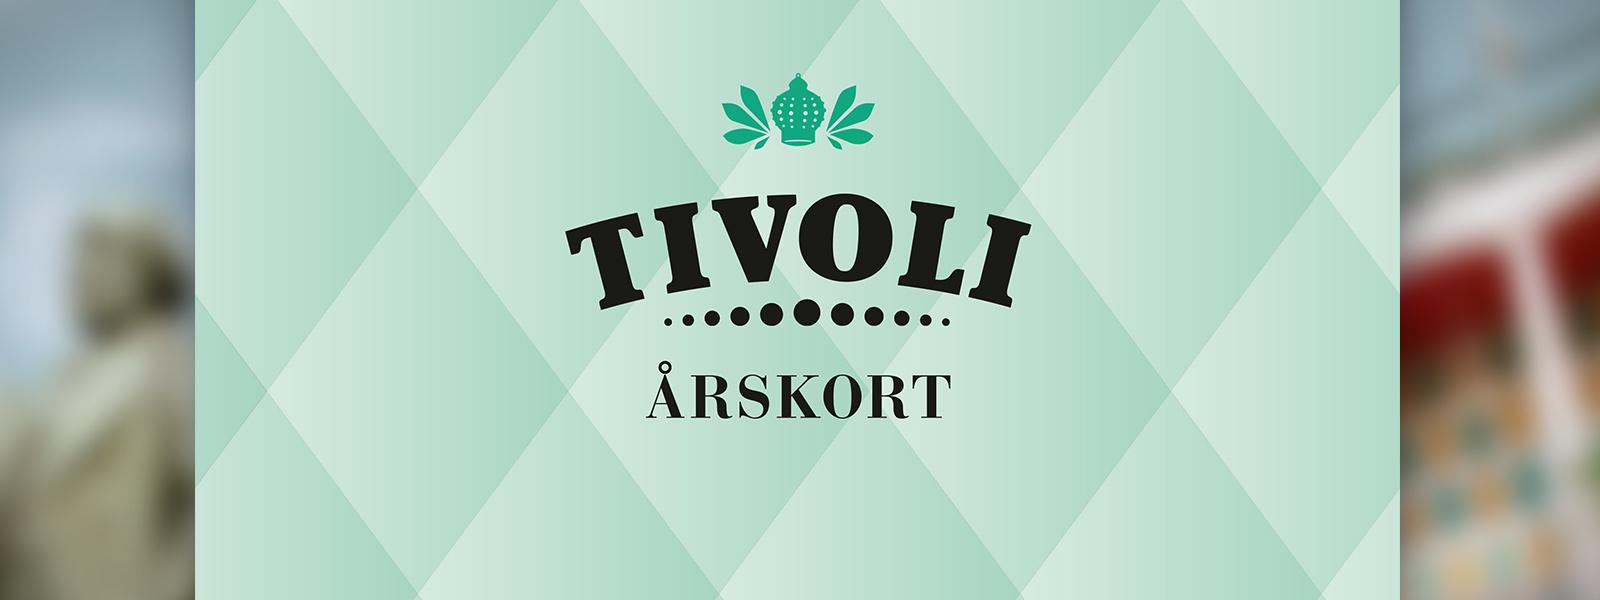 Årskort - Tivoli